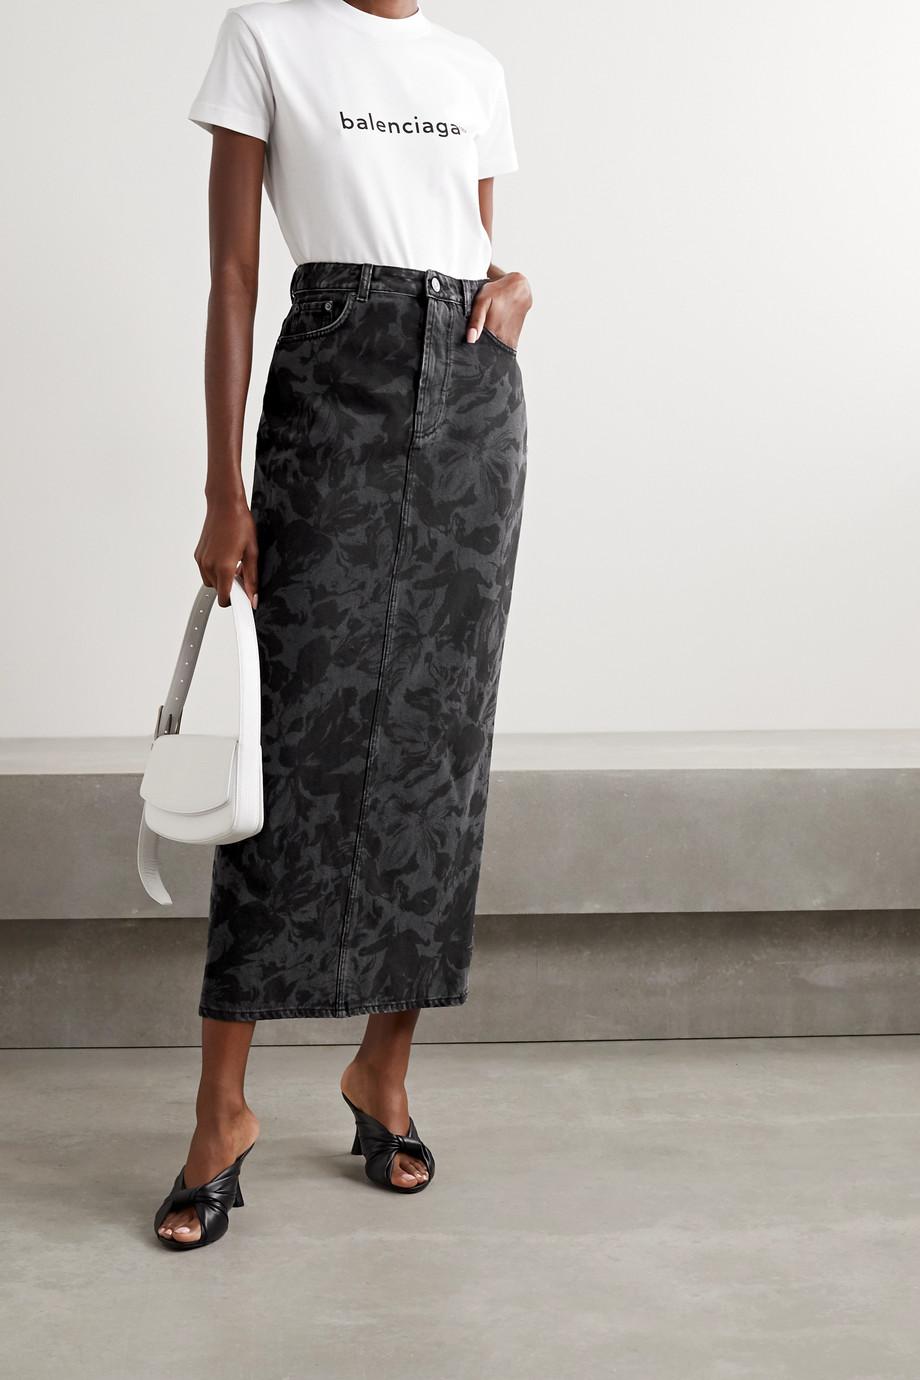 Balenciaga Floral-print denim midi skirt